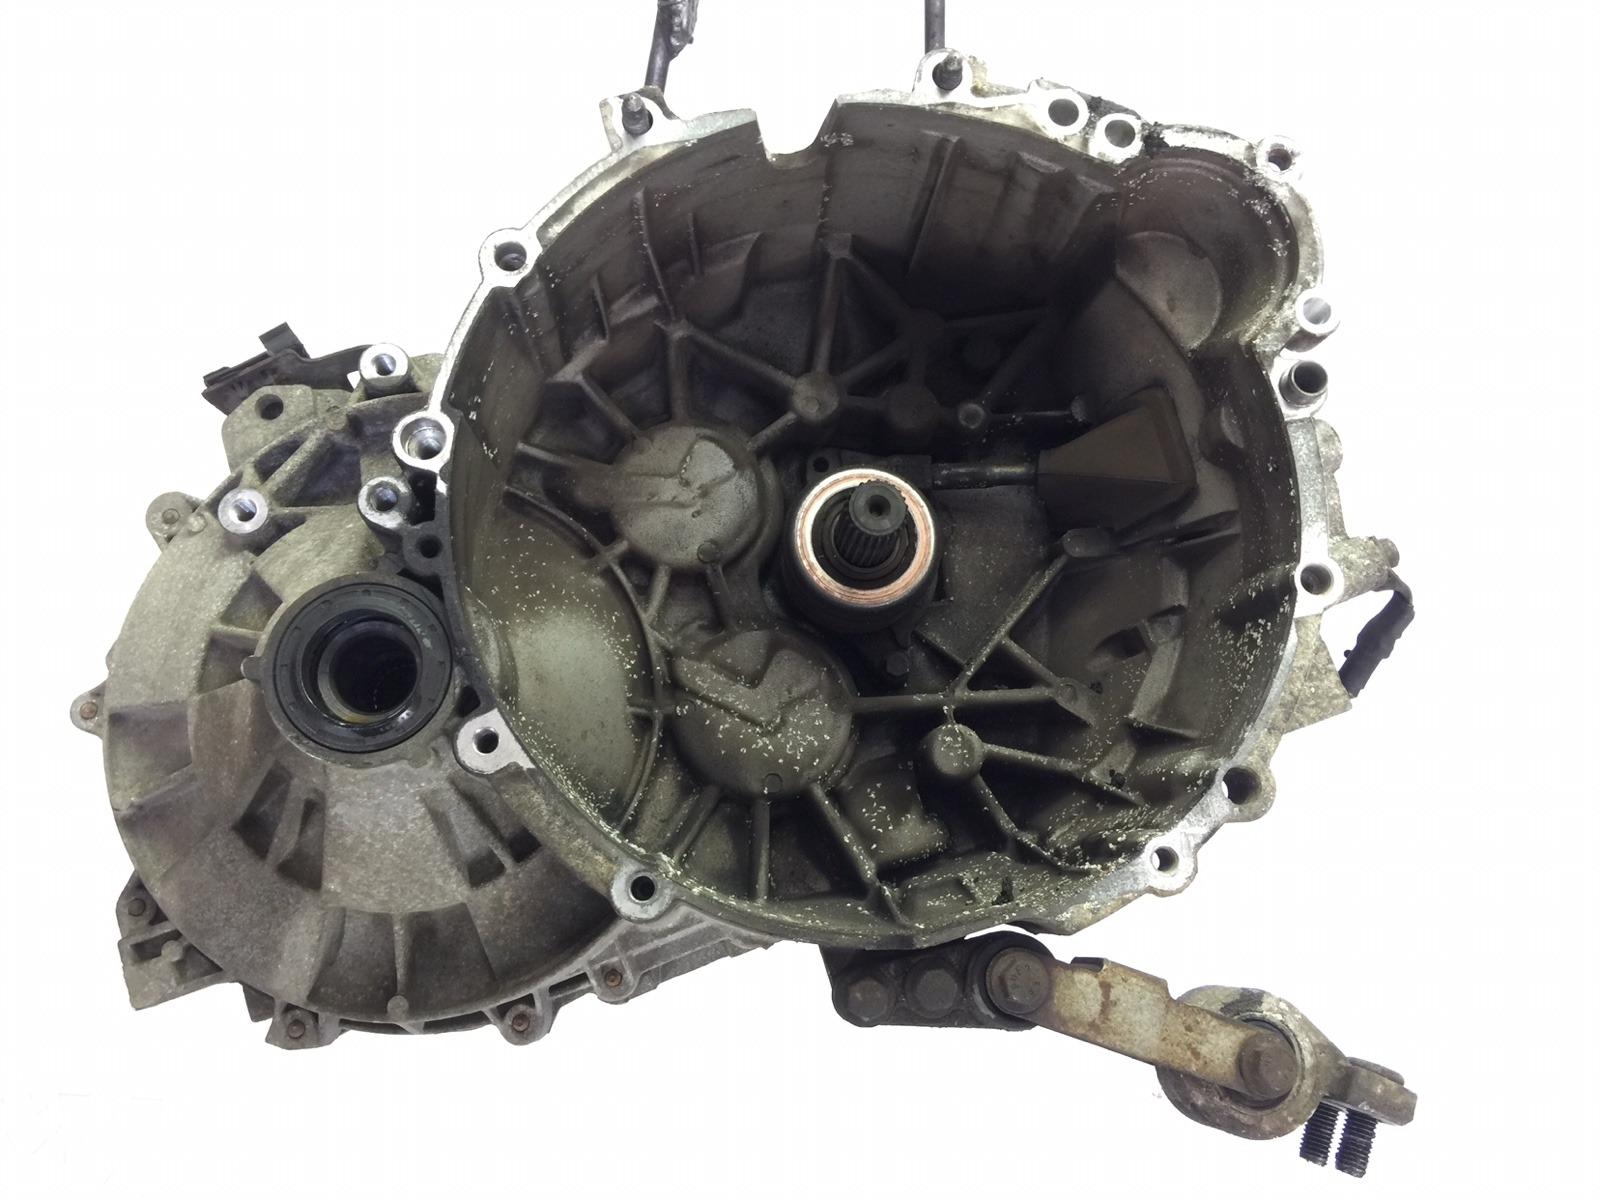 Кпп механическая (мкпп) Volvo V70 2.5 TI 2004 (б/у)